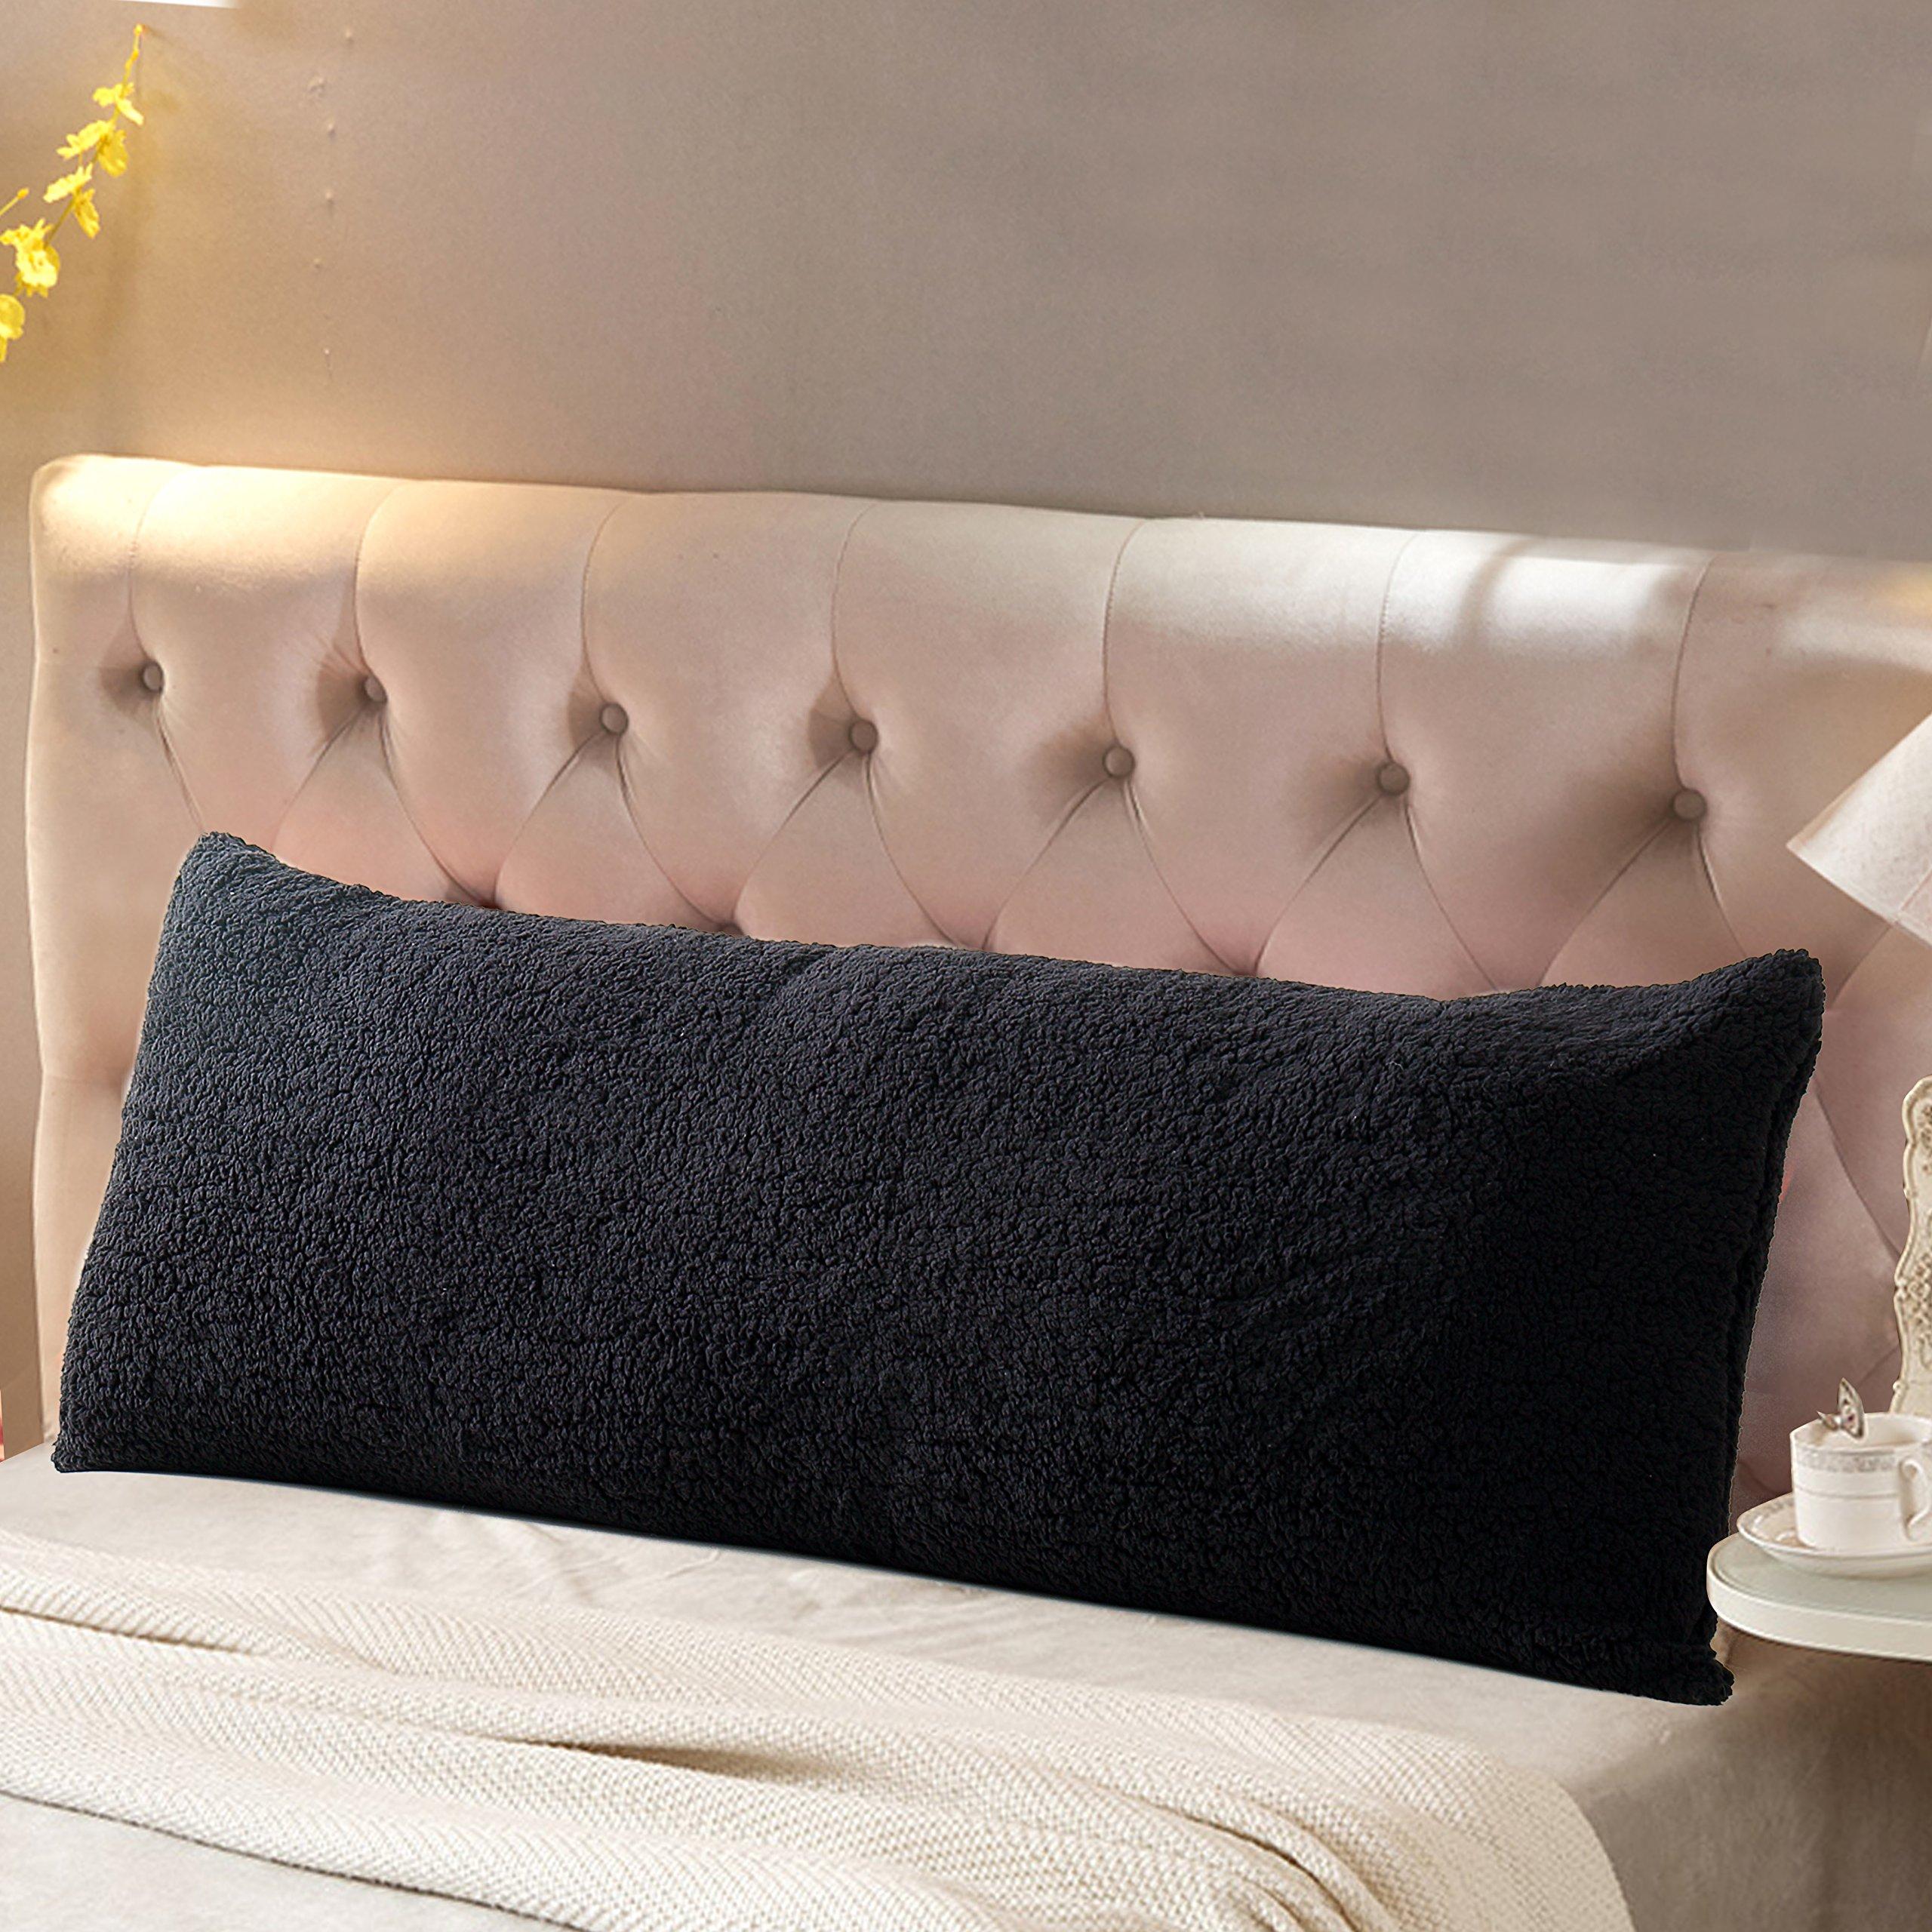 "Reafort Ultra Soft Sherpa Body Pillow Cover/Case with Zipper Closure 21''x54'' (Black, 21""X54)"